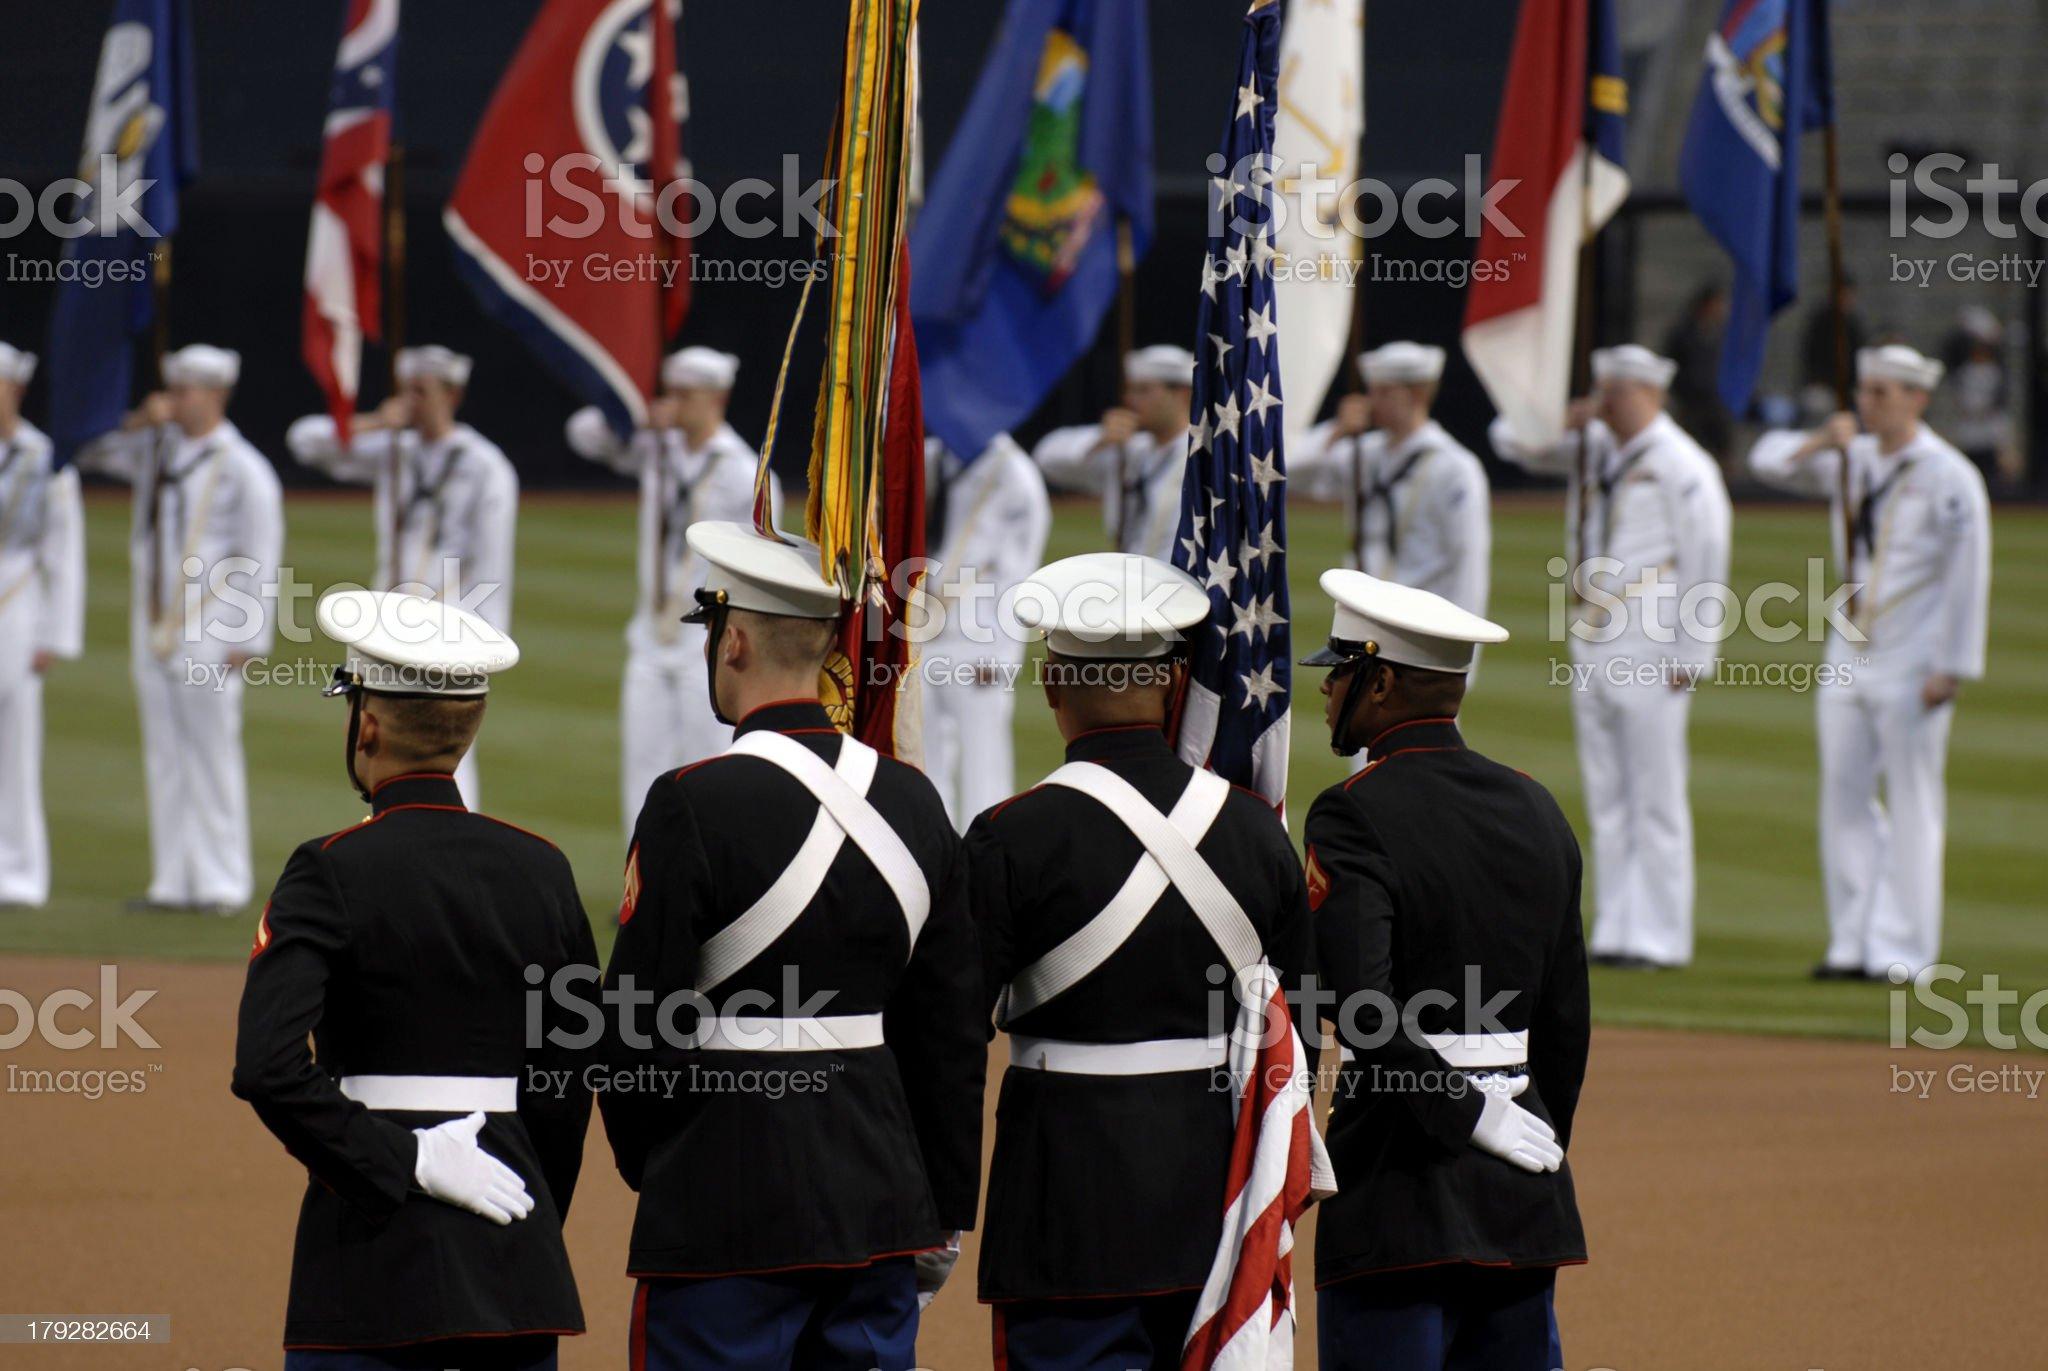 U.S. Marine Corps Color guard royalty-free stock photo